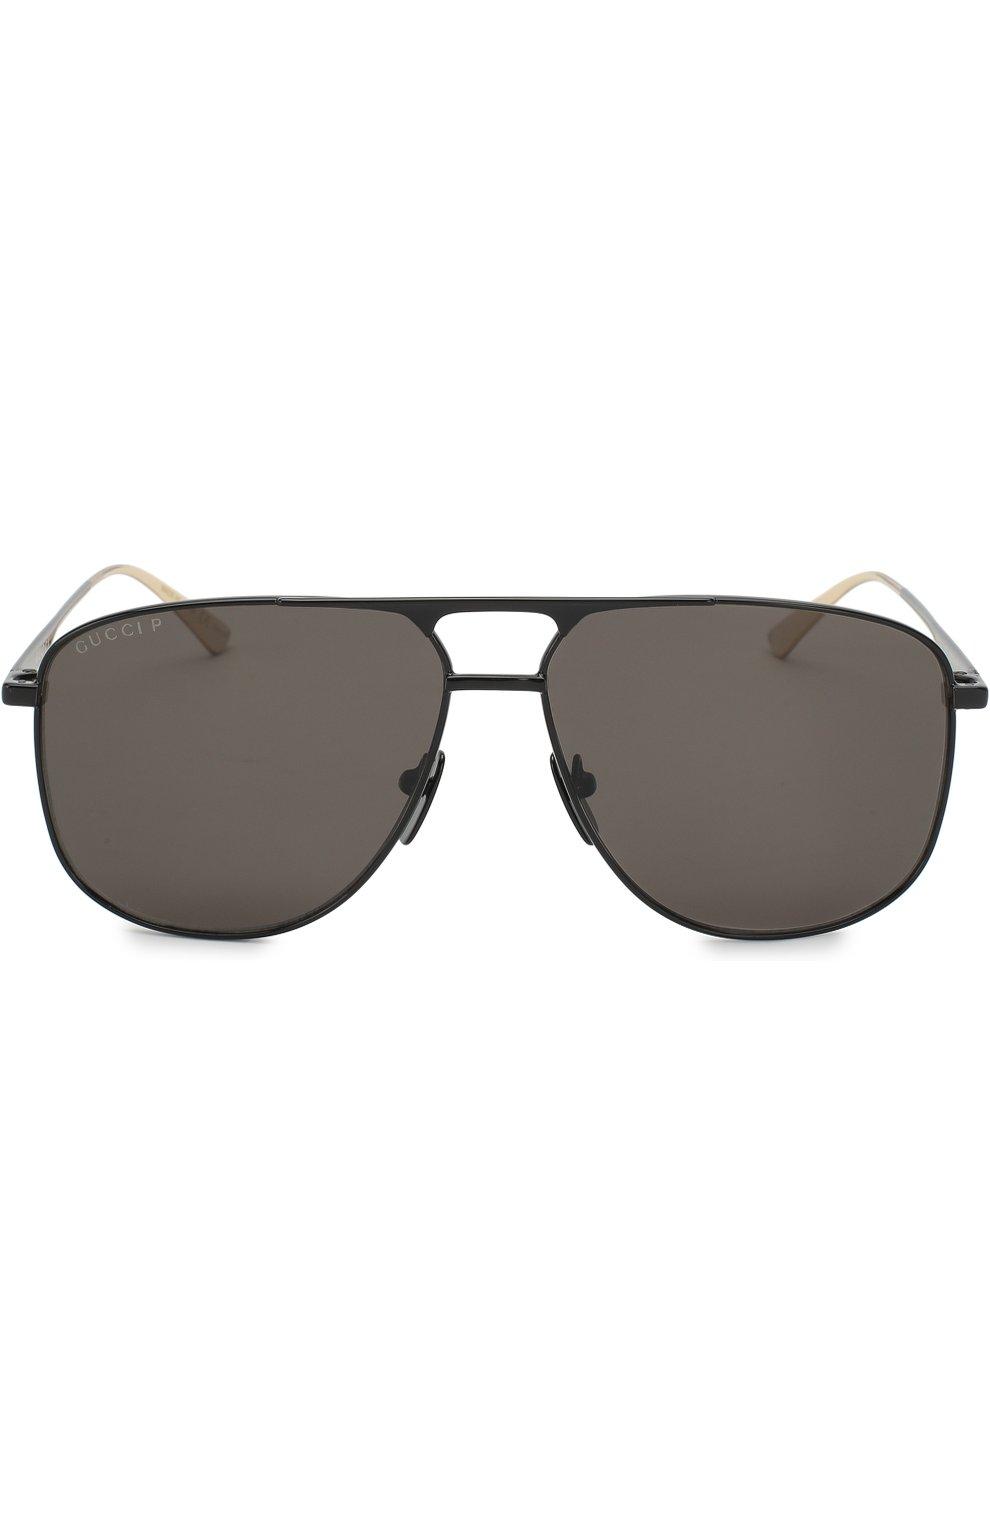 Мужские солнцезащитные очки GUCCI черного цвета, арт. GG0336 005   Фото 2